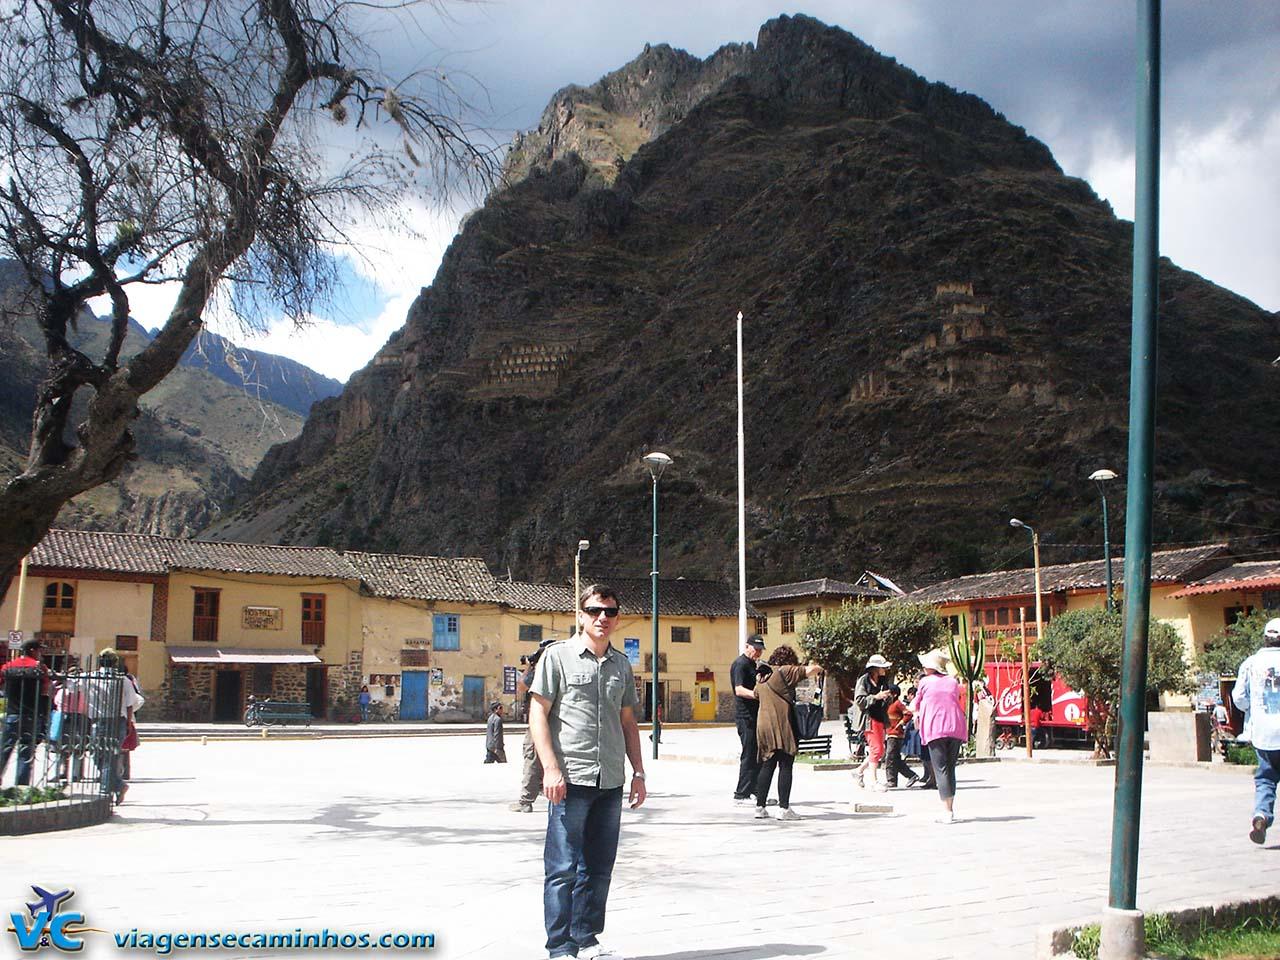 Praça de Ollamtaytambo e Pinkullyuna ao fundo